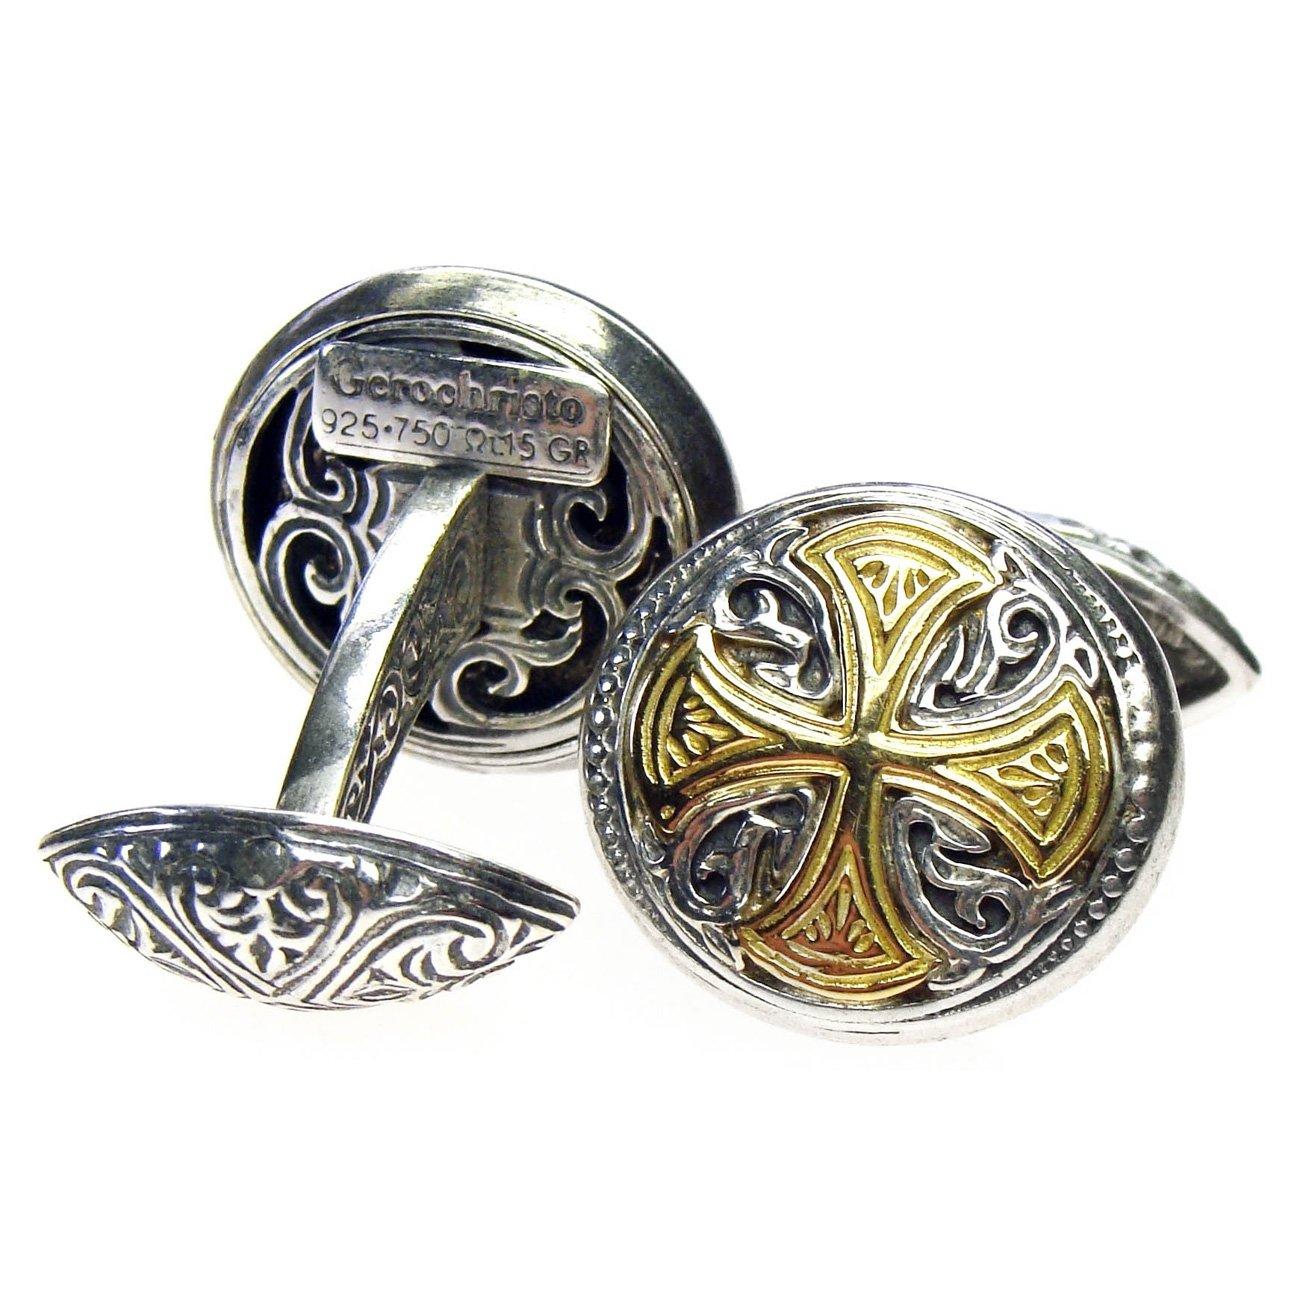 Gerochristo 7106 - Solid Gold & Silver Medieval-Byzantine Cross Cufflinks